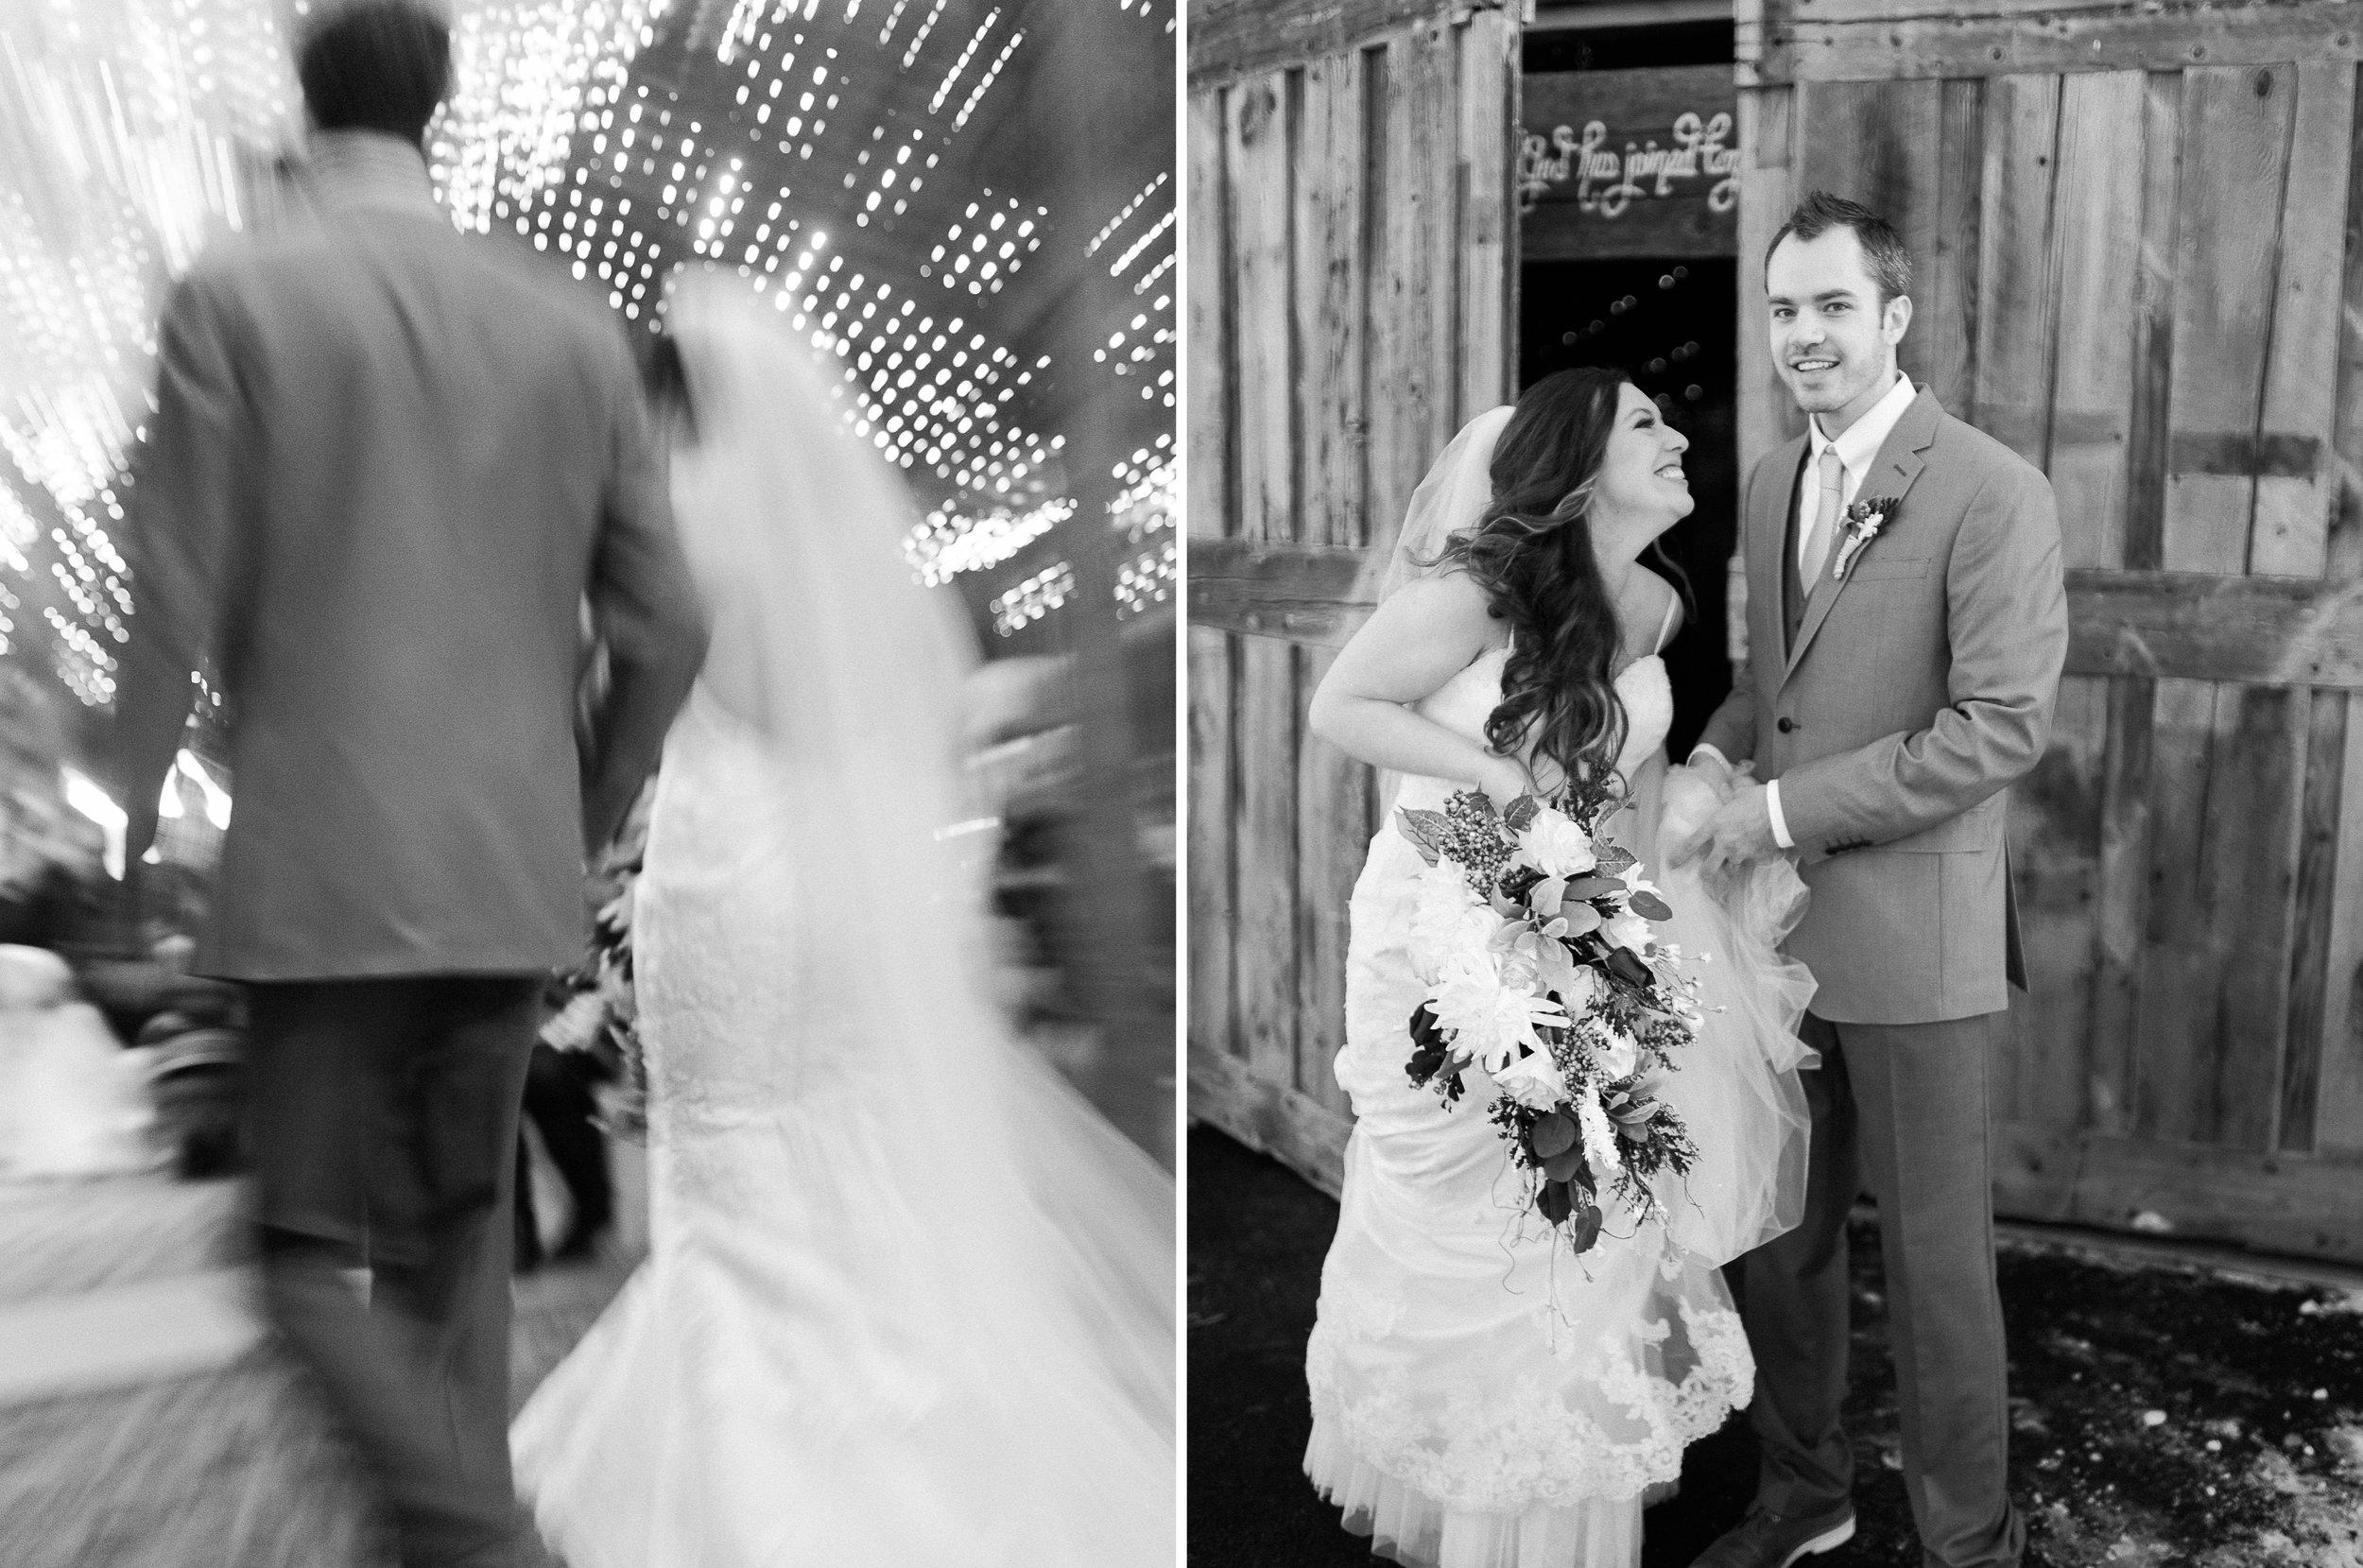 Ben+Joella | Jacob+Alana Wedding35.jpg